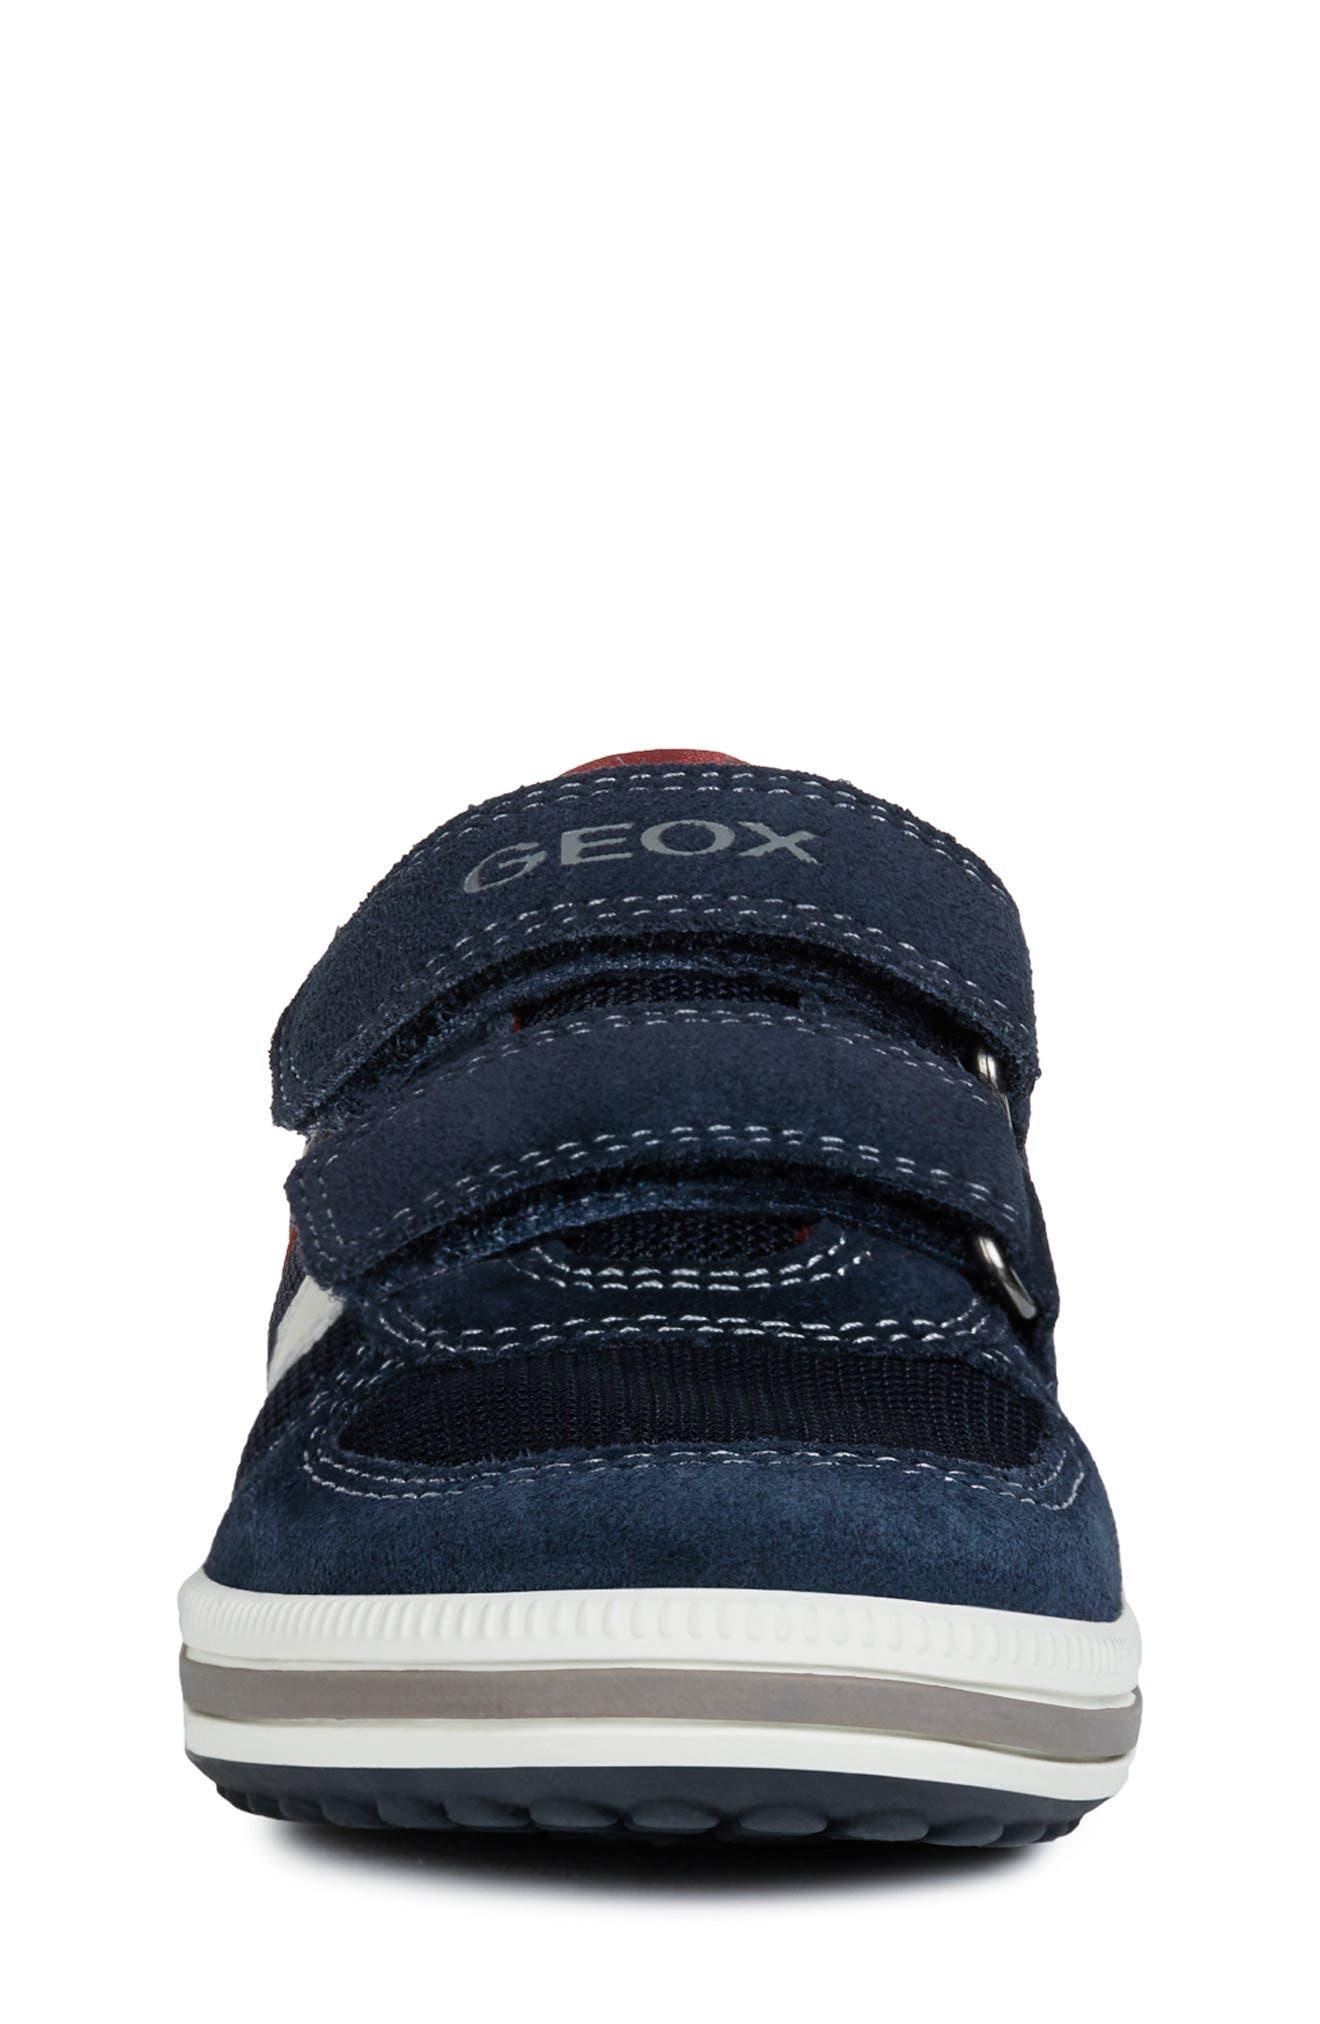 GEOX, 'Vita' Sneaker, Alternate thumbnail 4, color, NAVY/ RED